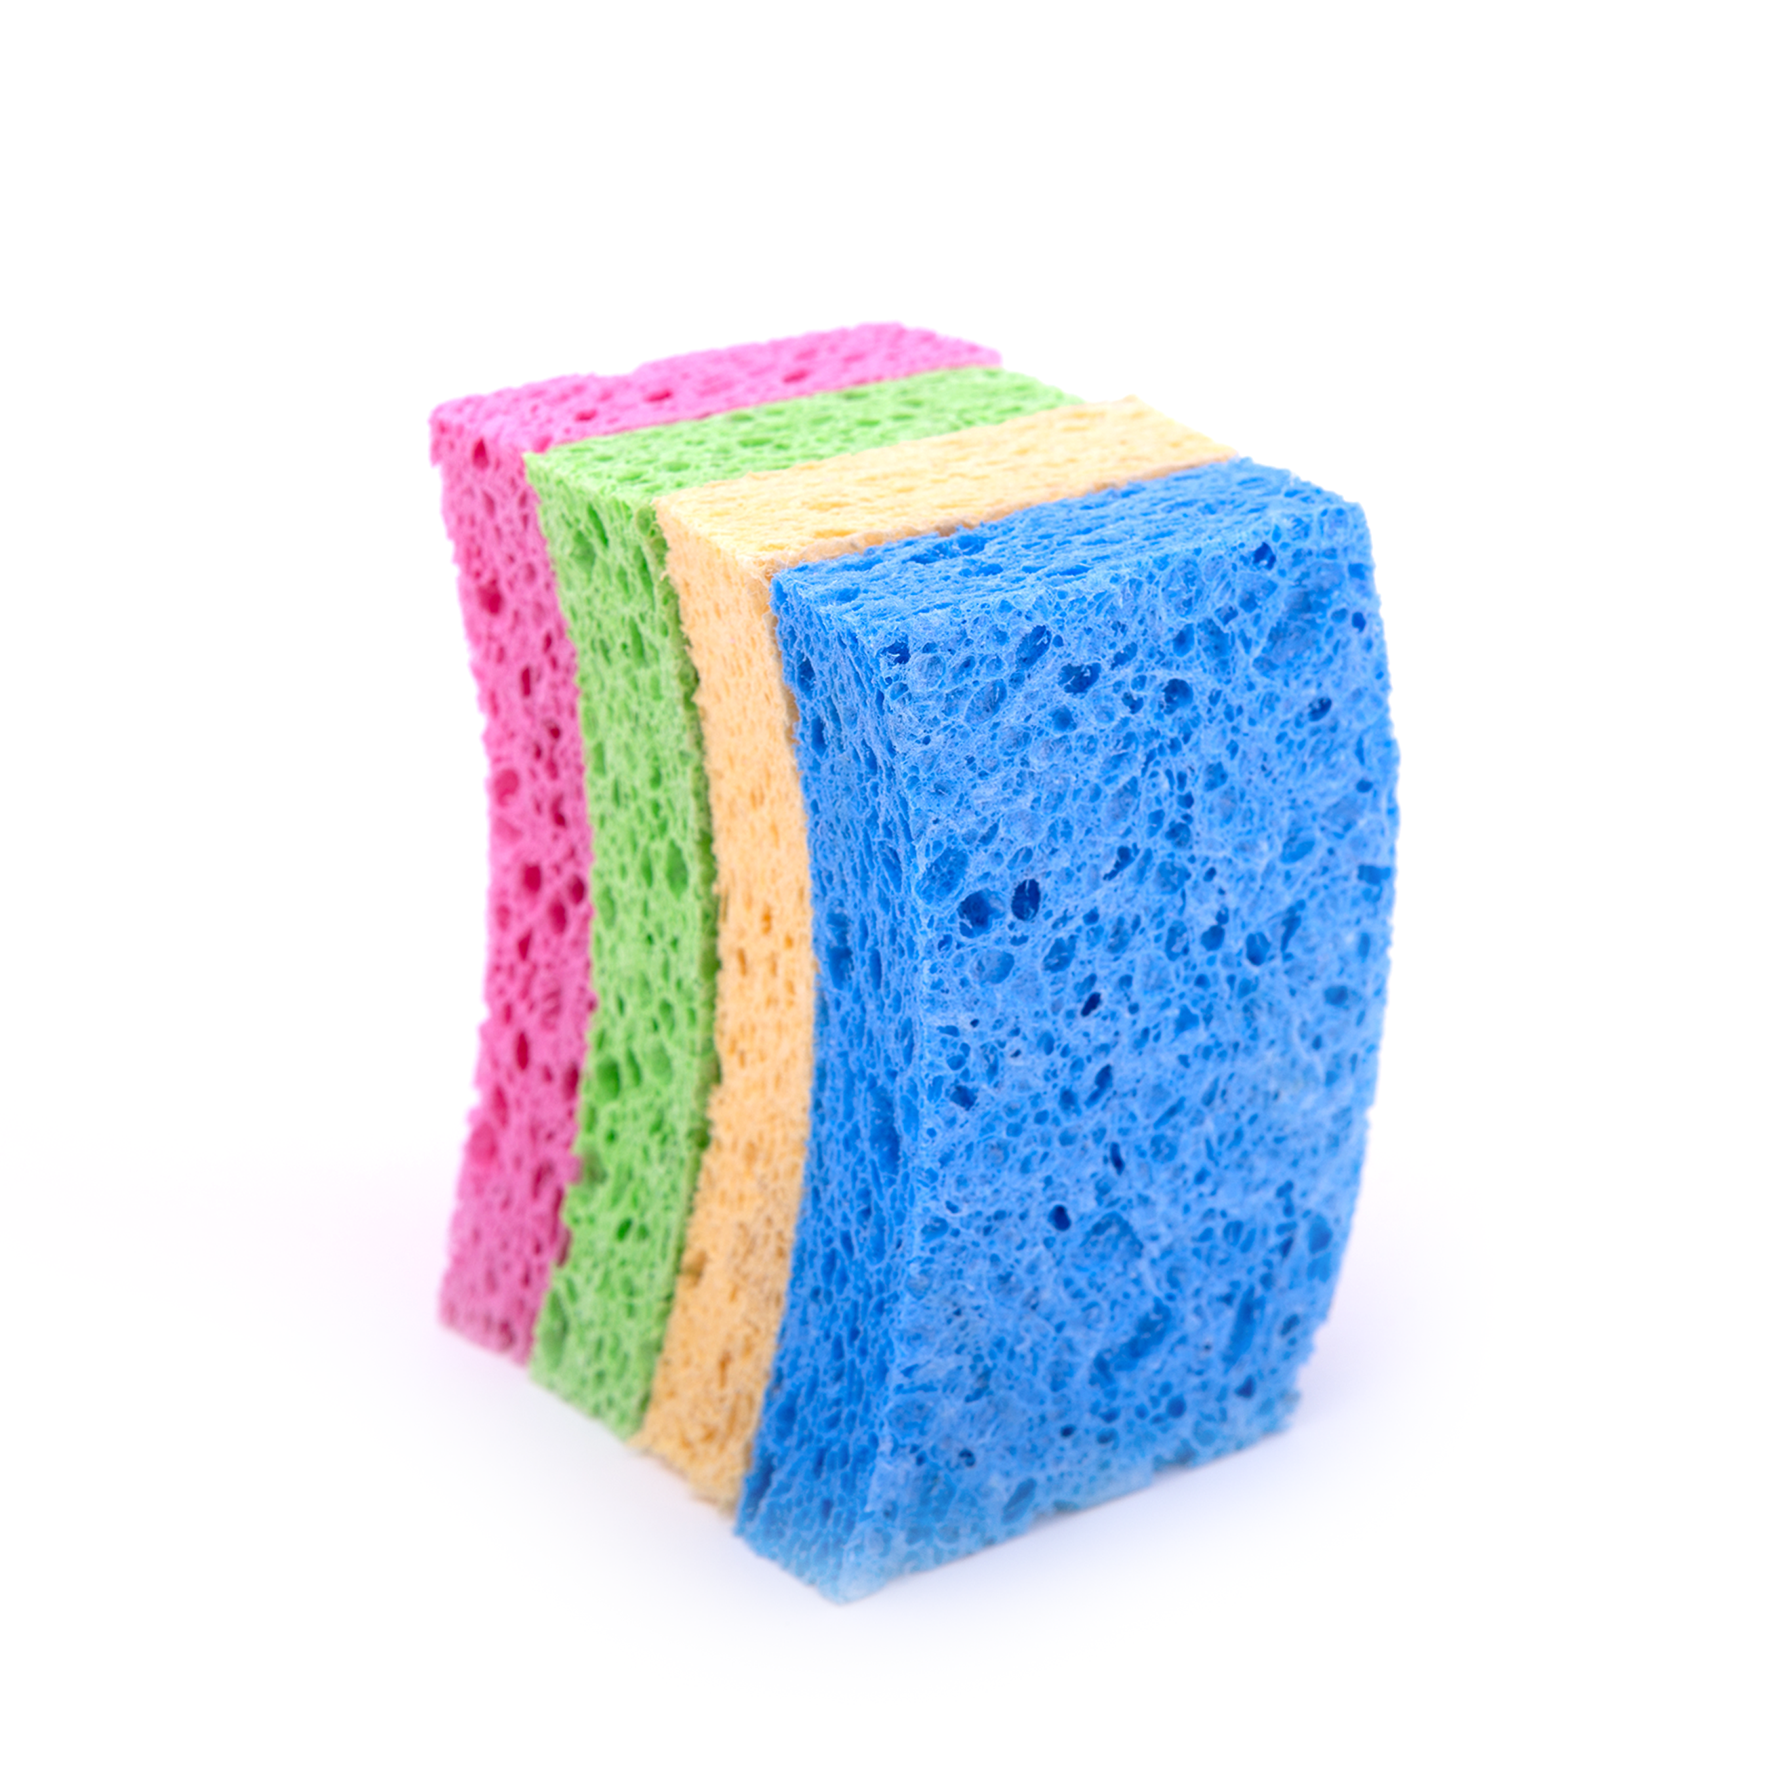 DH-A5-6 高品质海绵环保多用途纤维素海绵